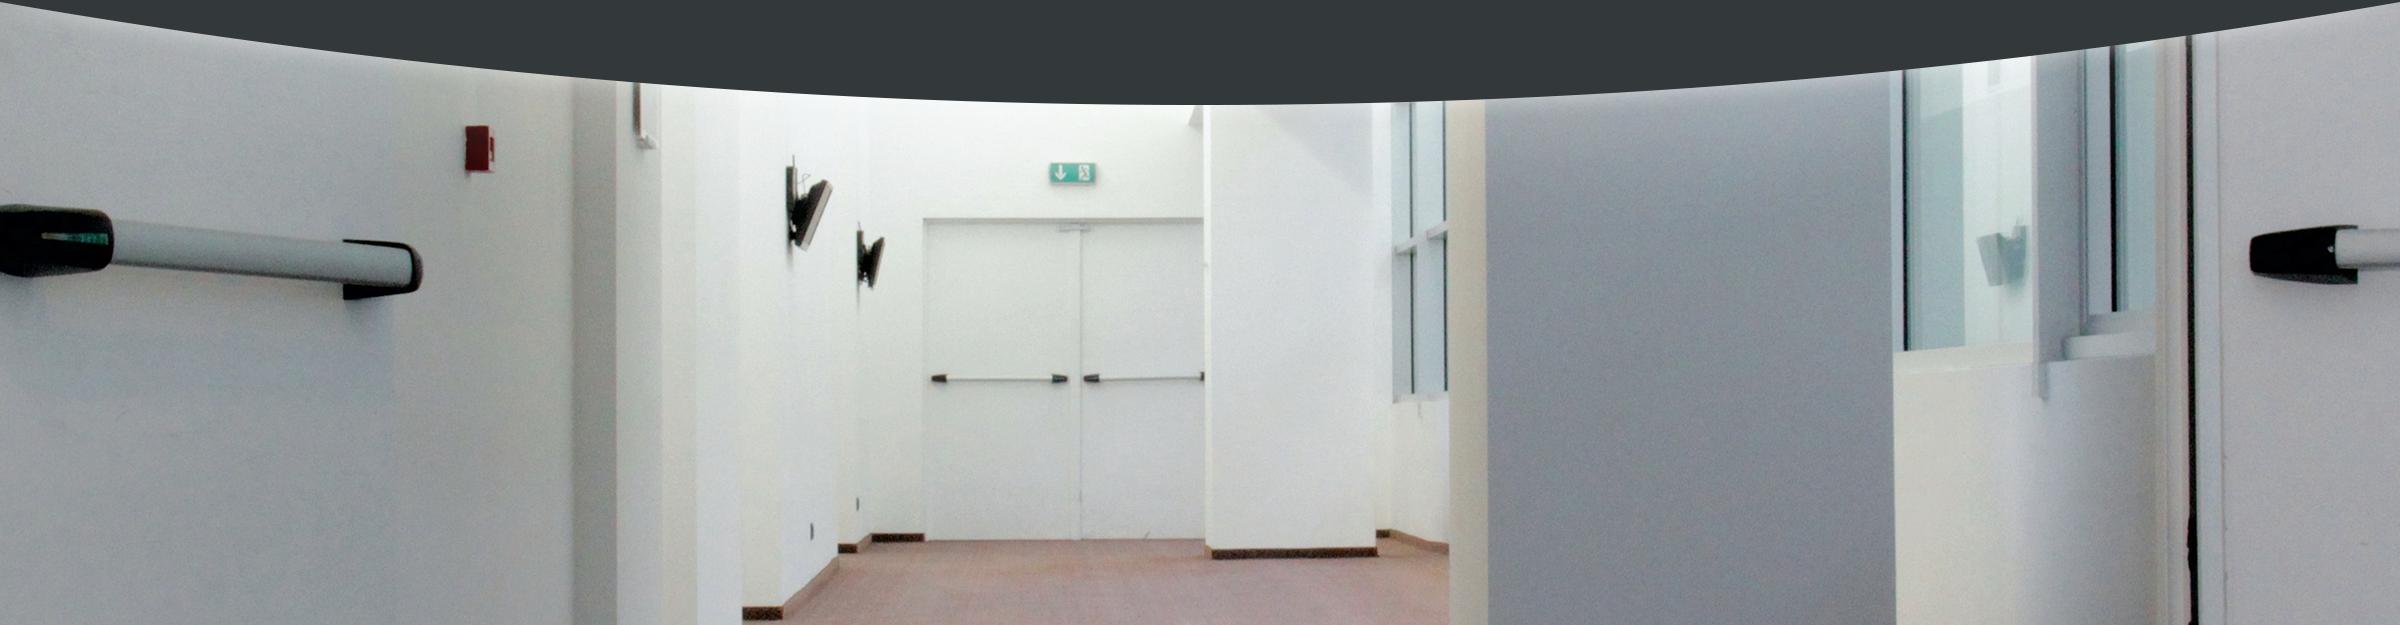 uPVC Windows and Fire Doors